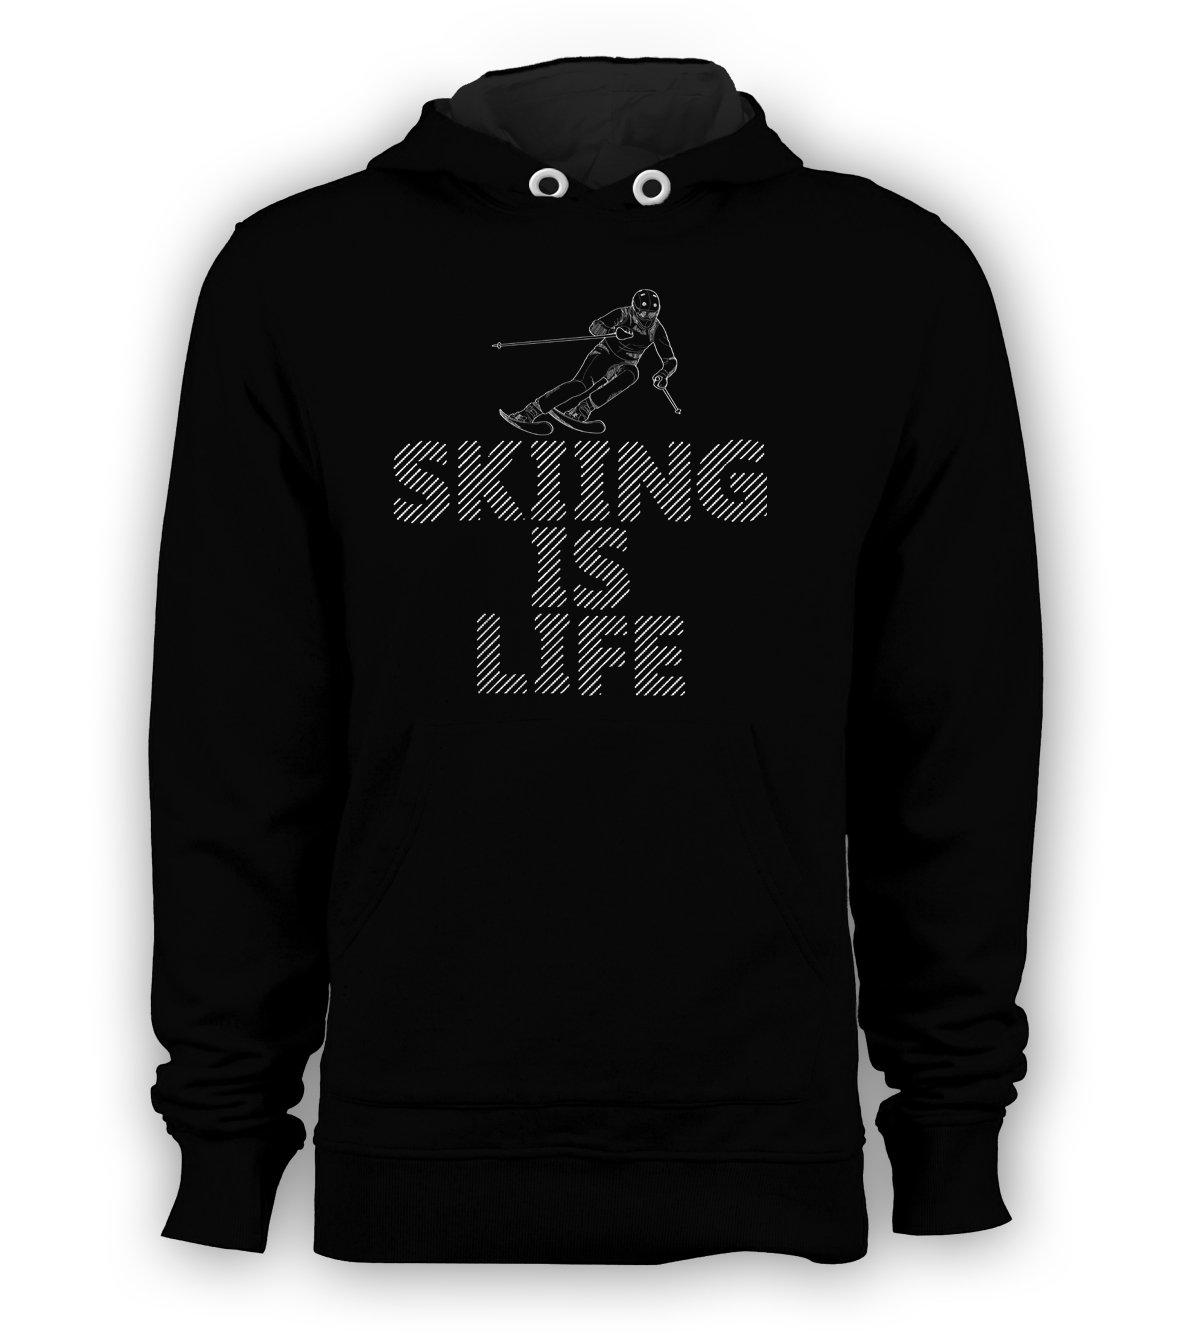 Skiing Hooded Men's Pullover Hoodie - Skiing is Life Sweatshirt Winter Sport New